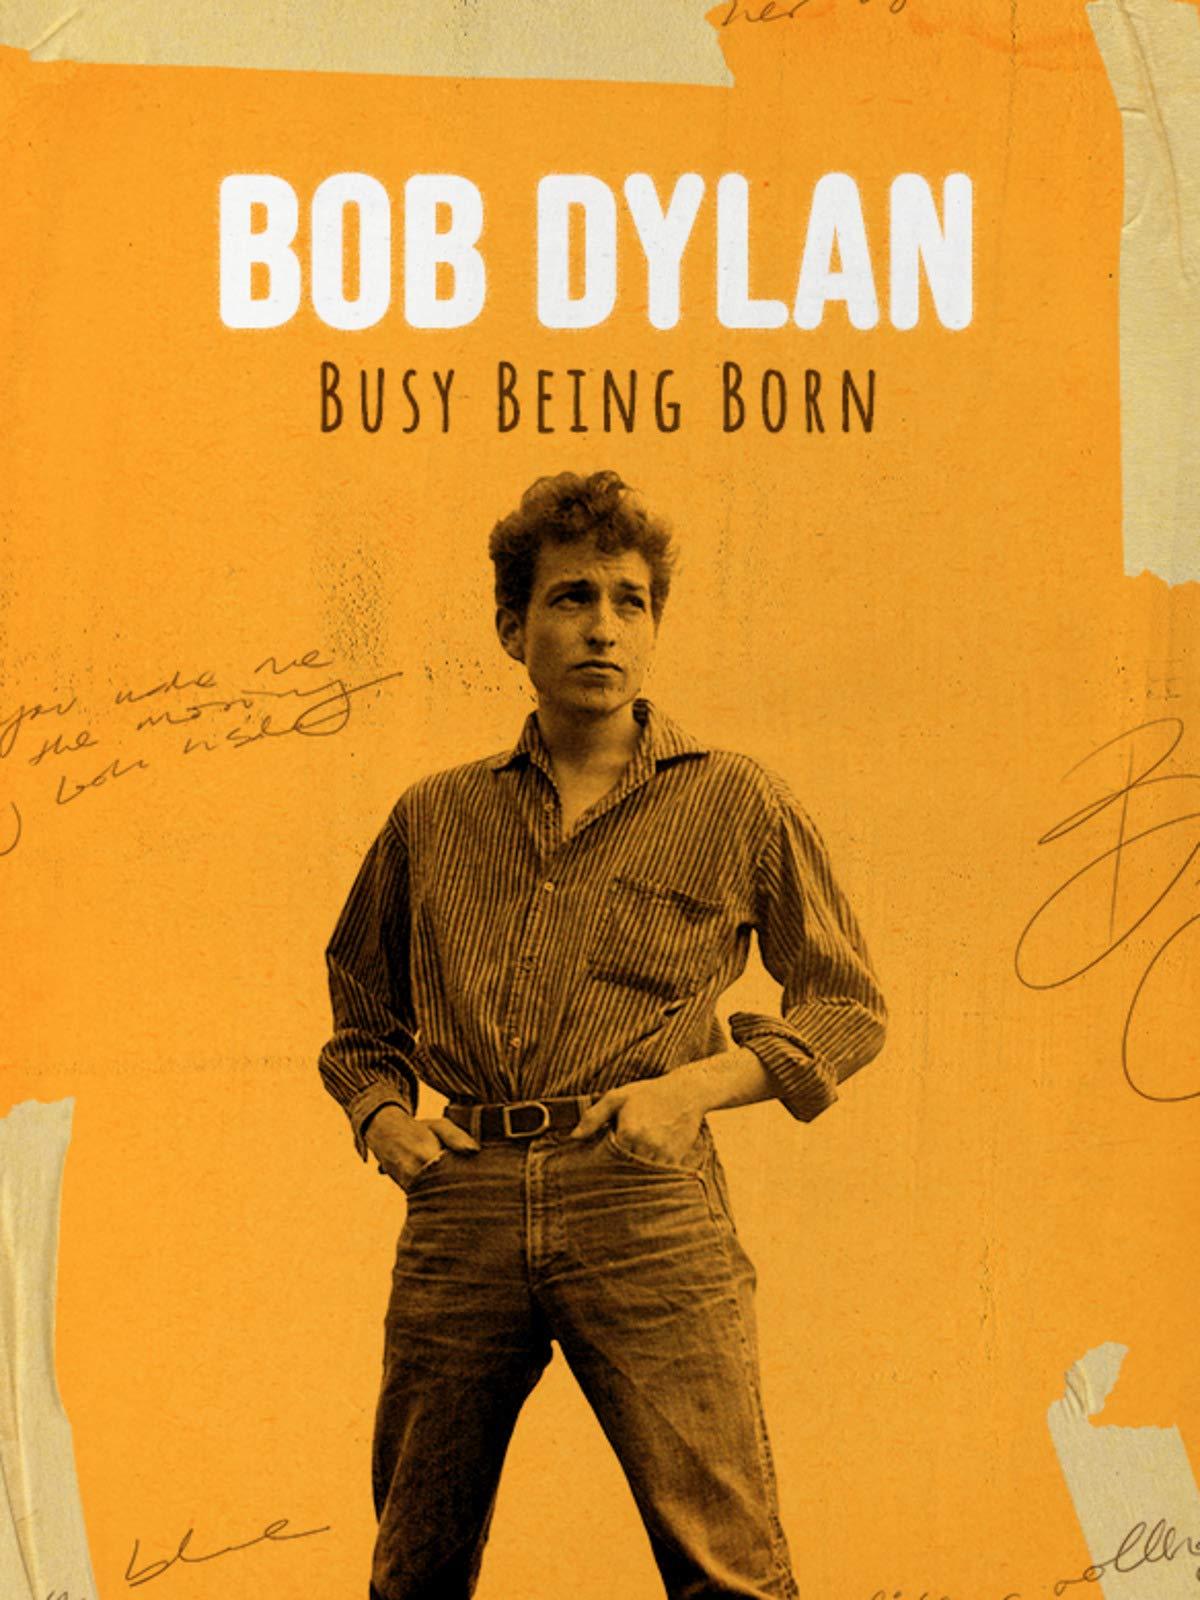 Bob Dylan: Busy Being Born